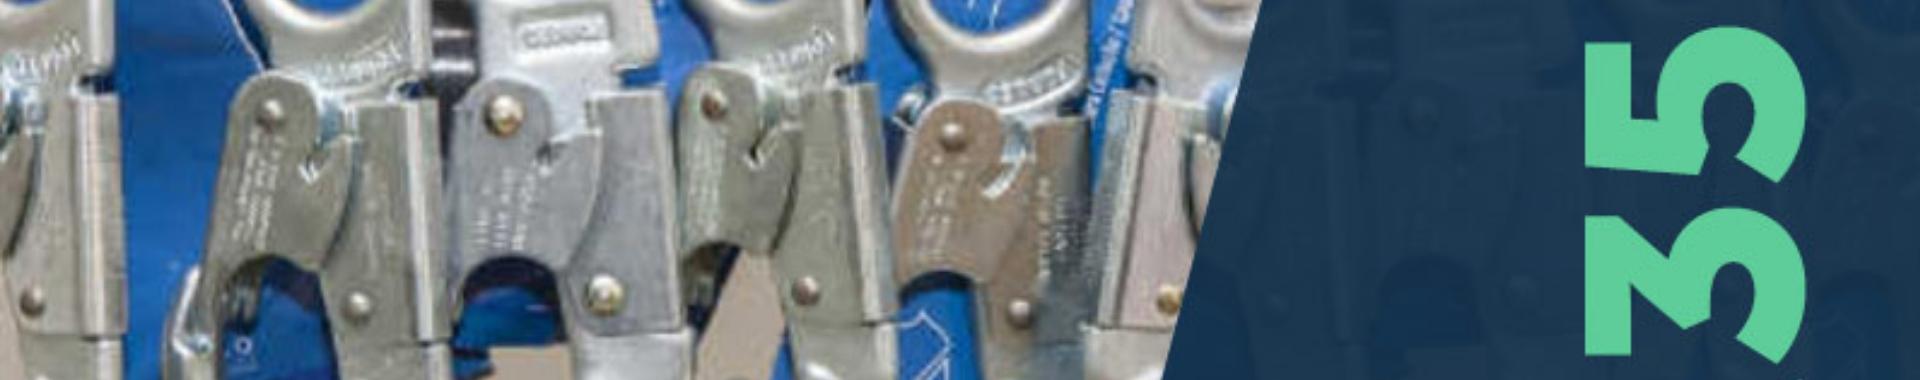 equipamentos NR 35